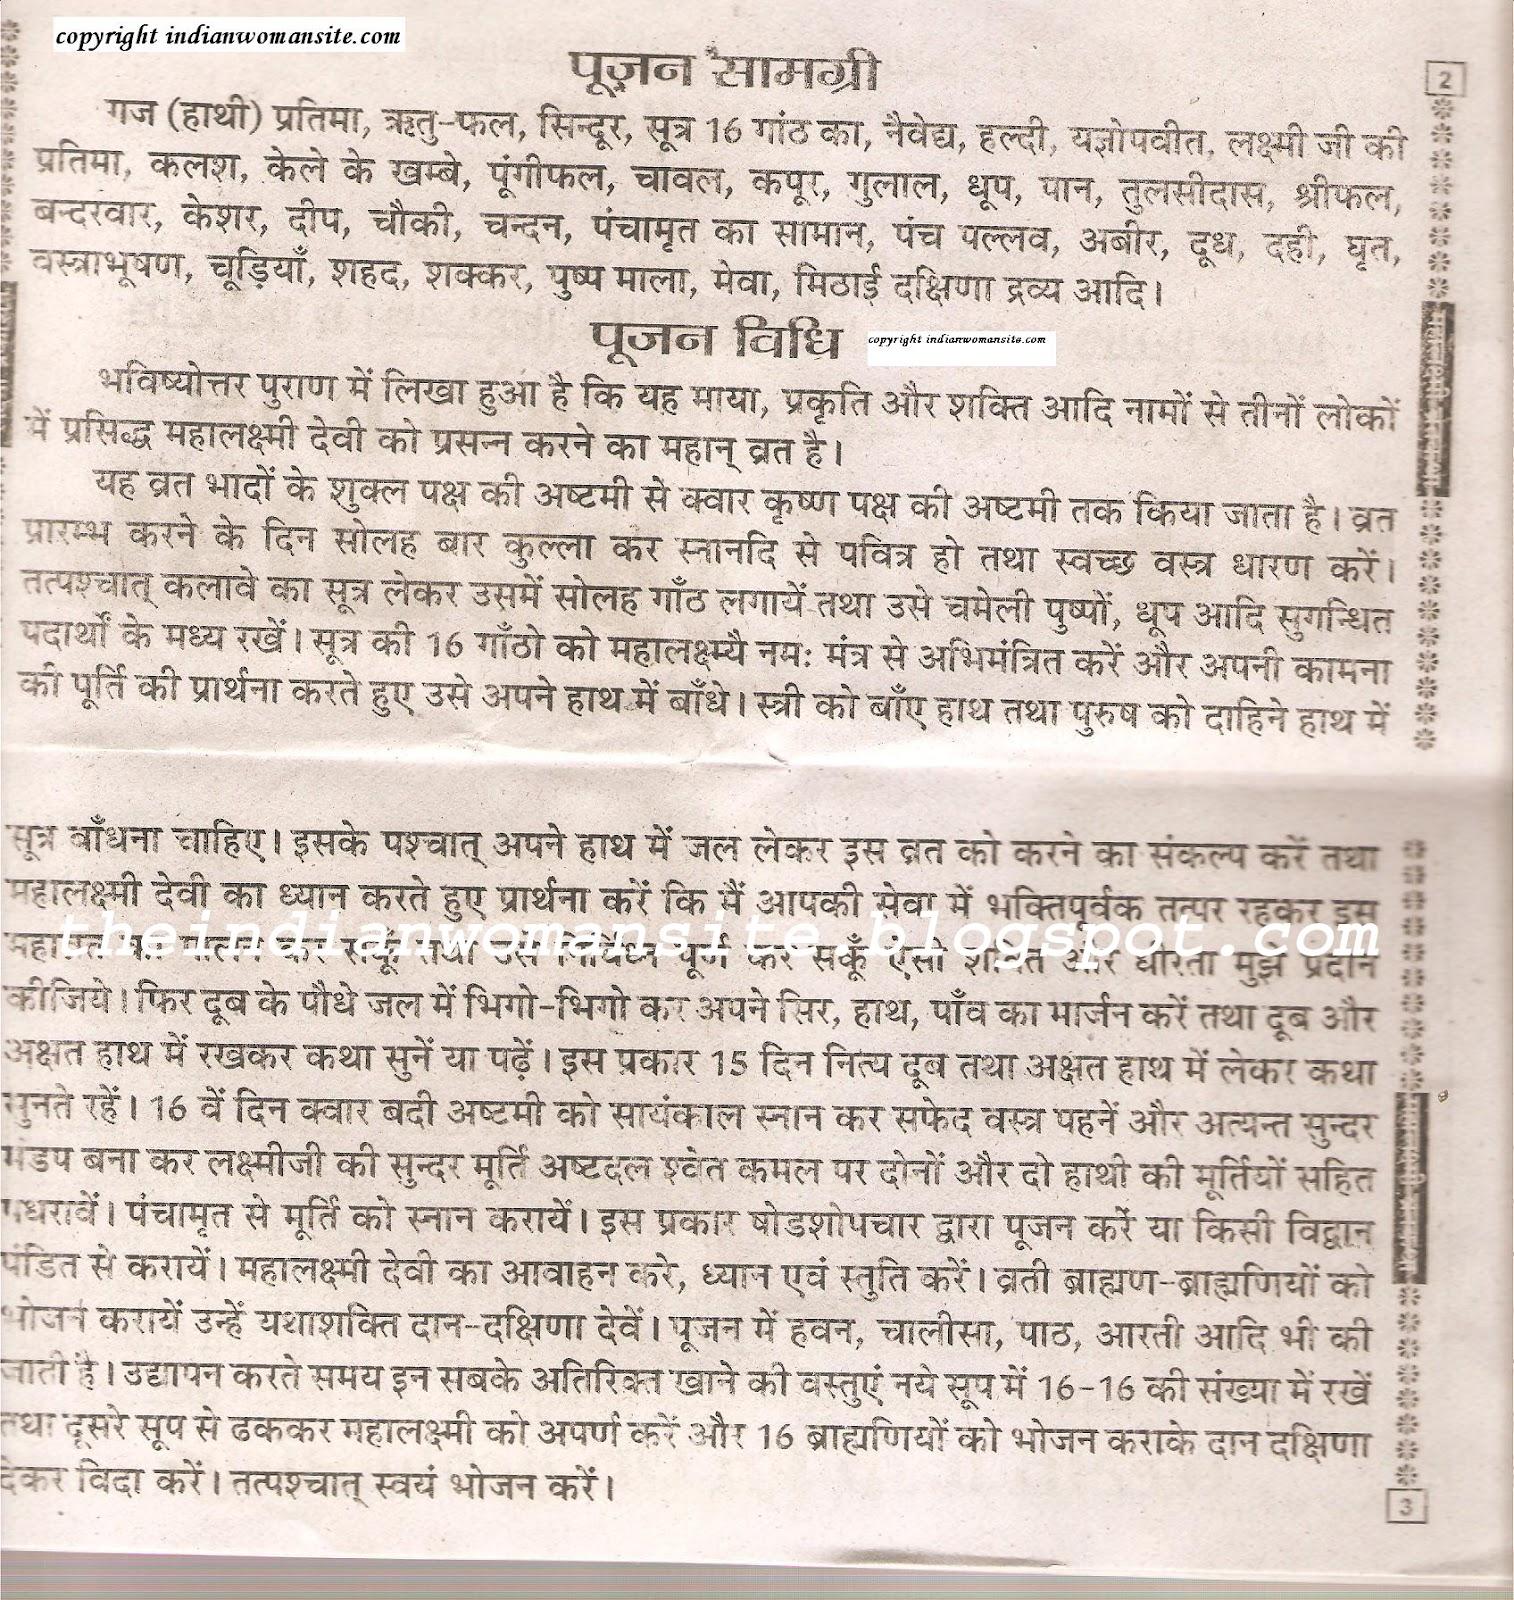 sai vrat katha in hindi pdf